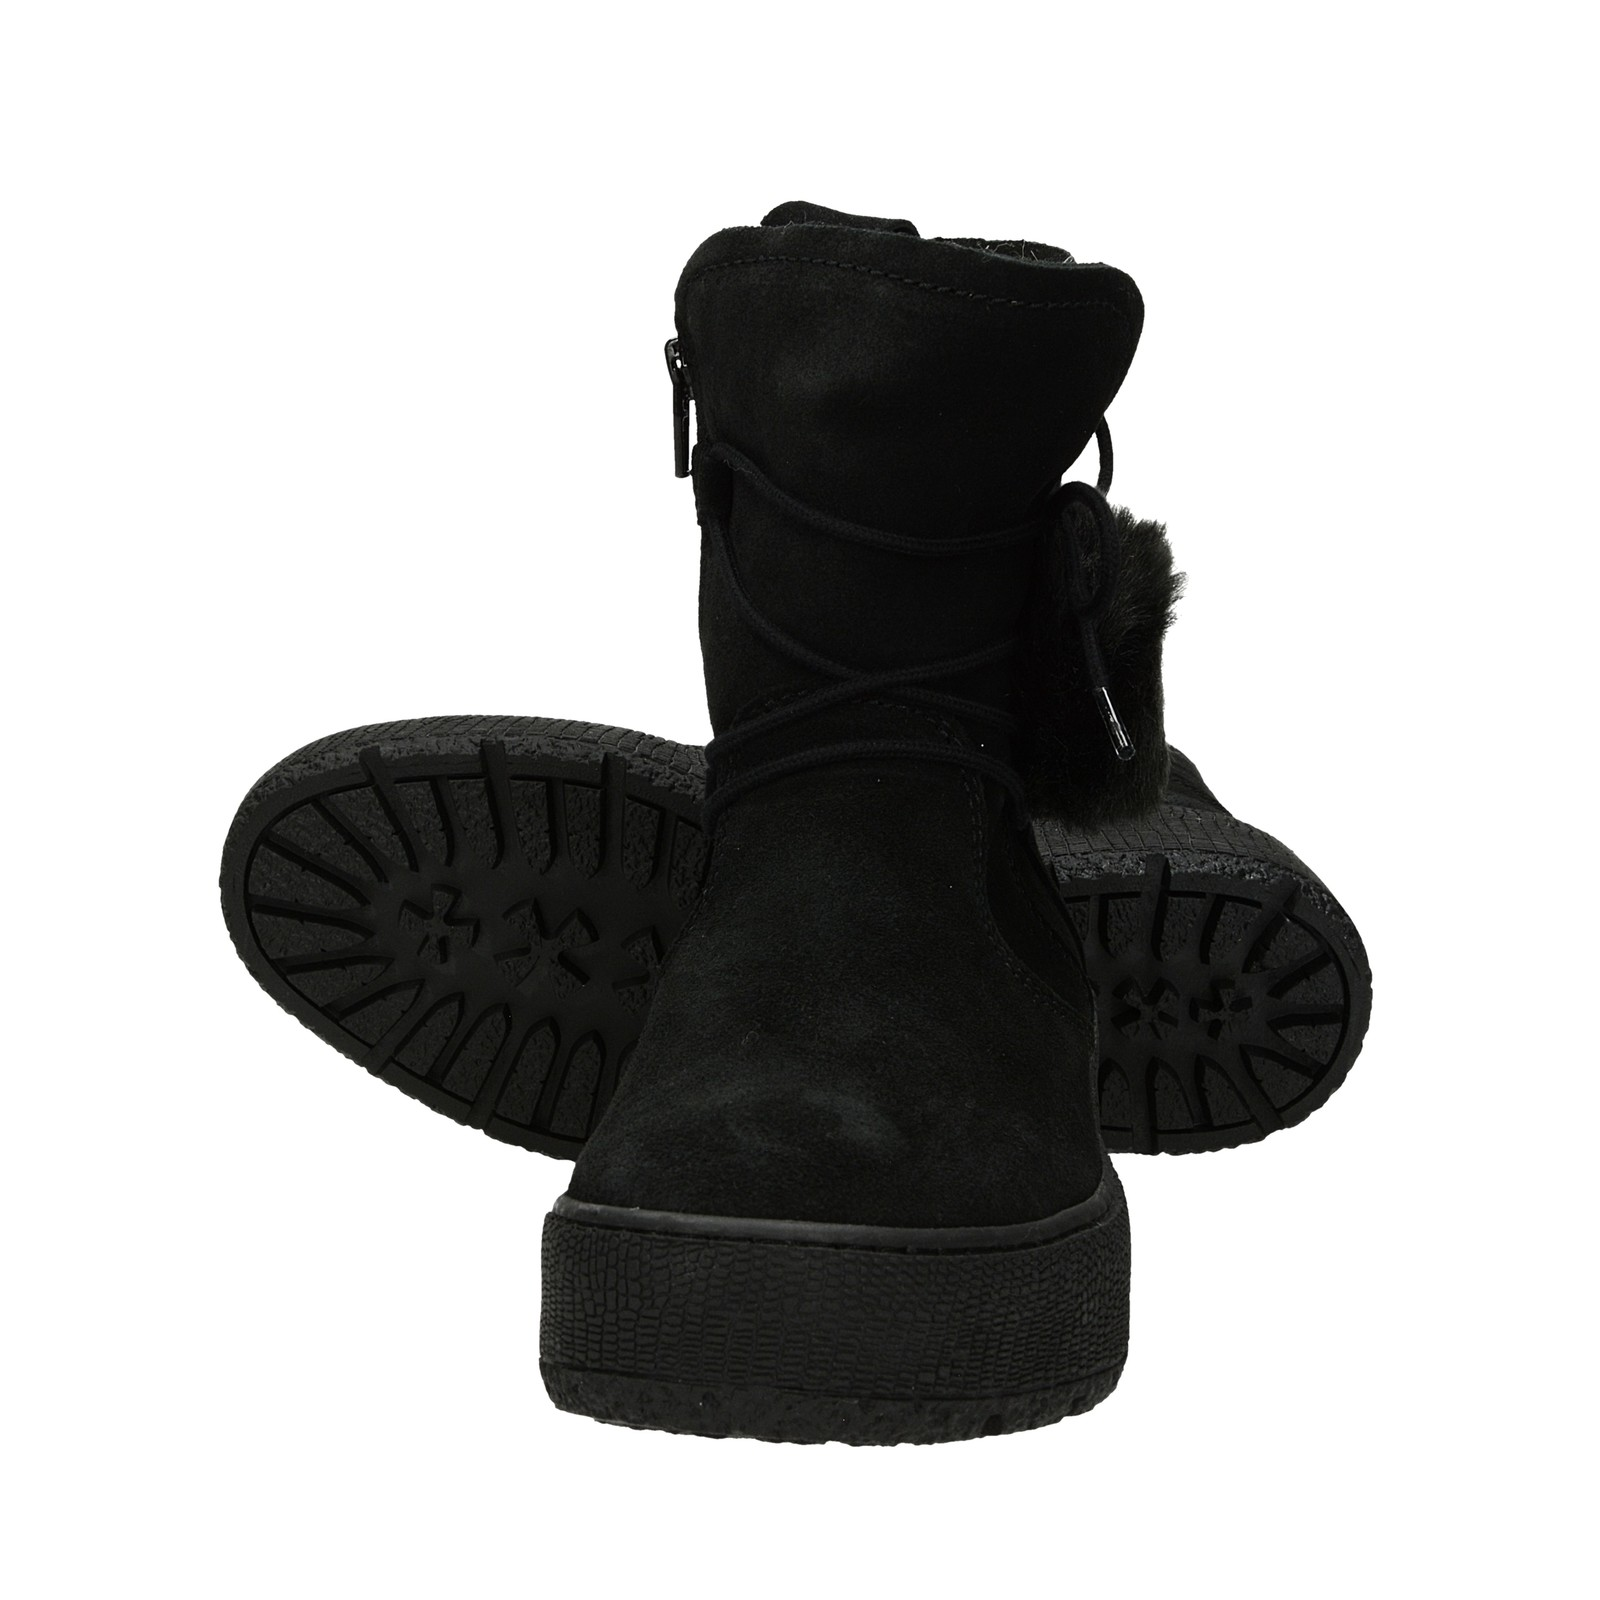 Tamaris dámske semišové nízke čižmy - čierne ... 2384bece1d6